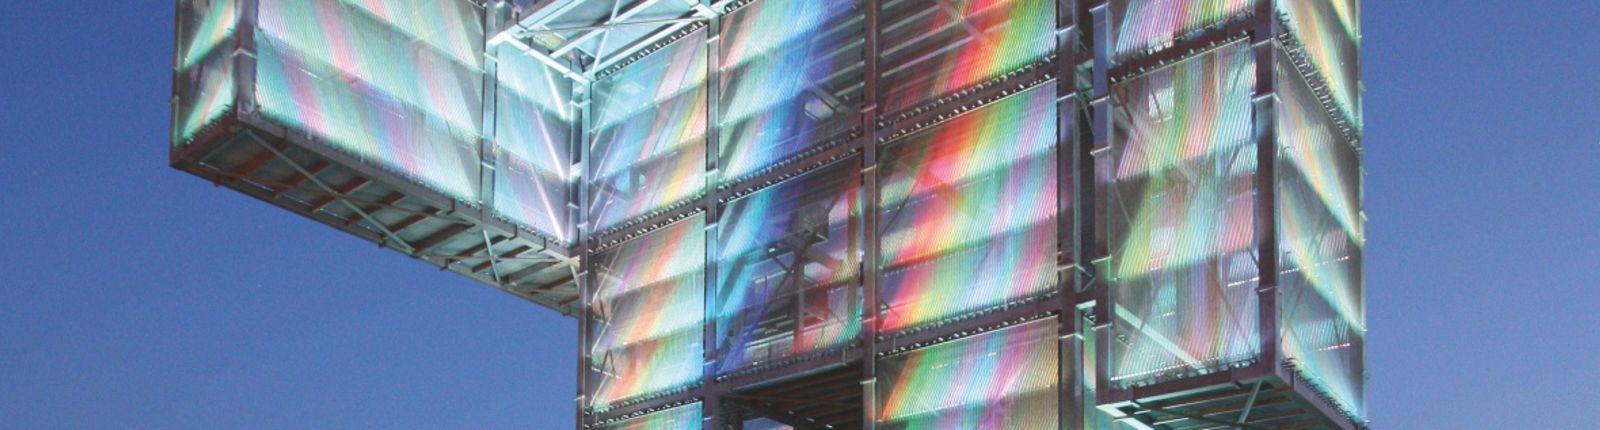 Transparent media façade and viewing platform – the Indemann